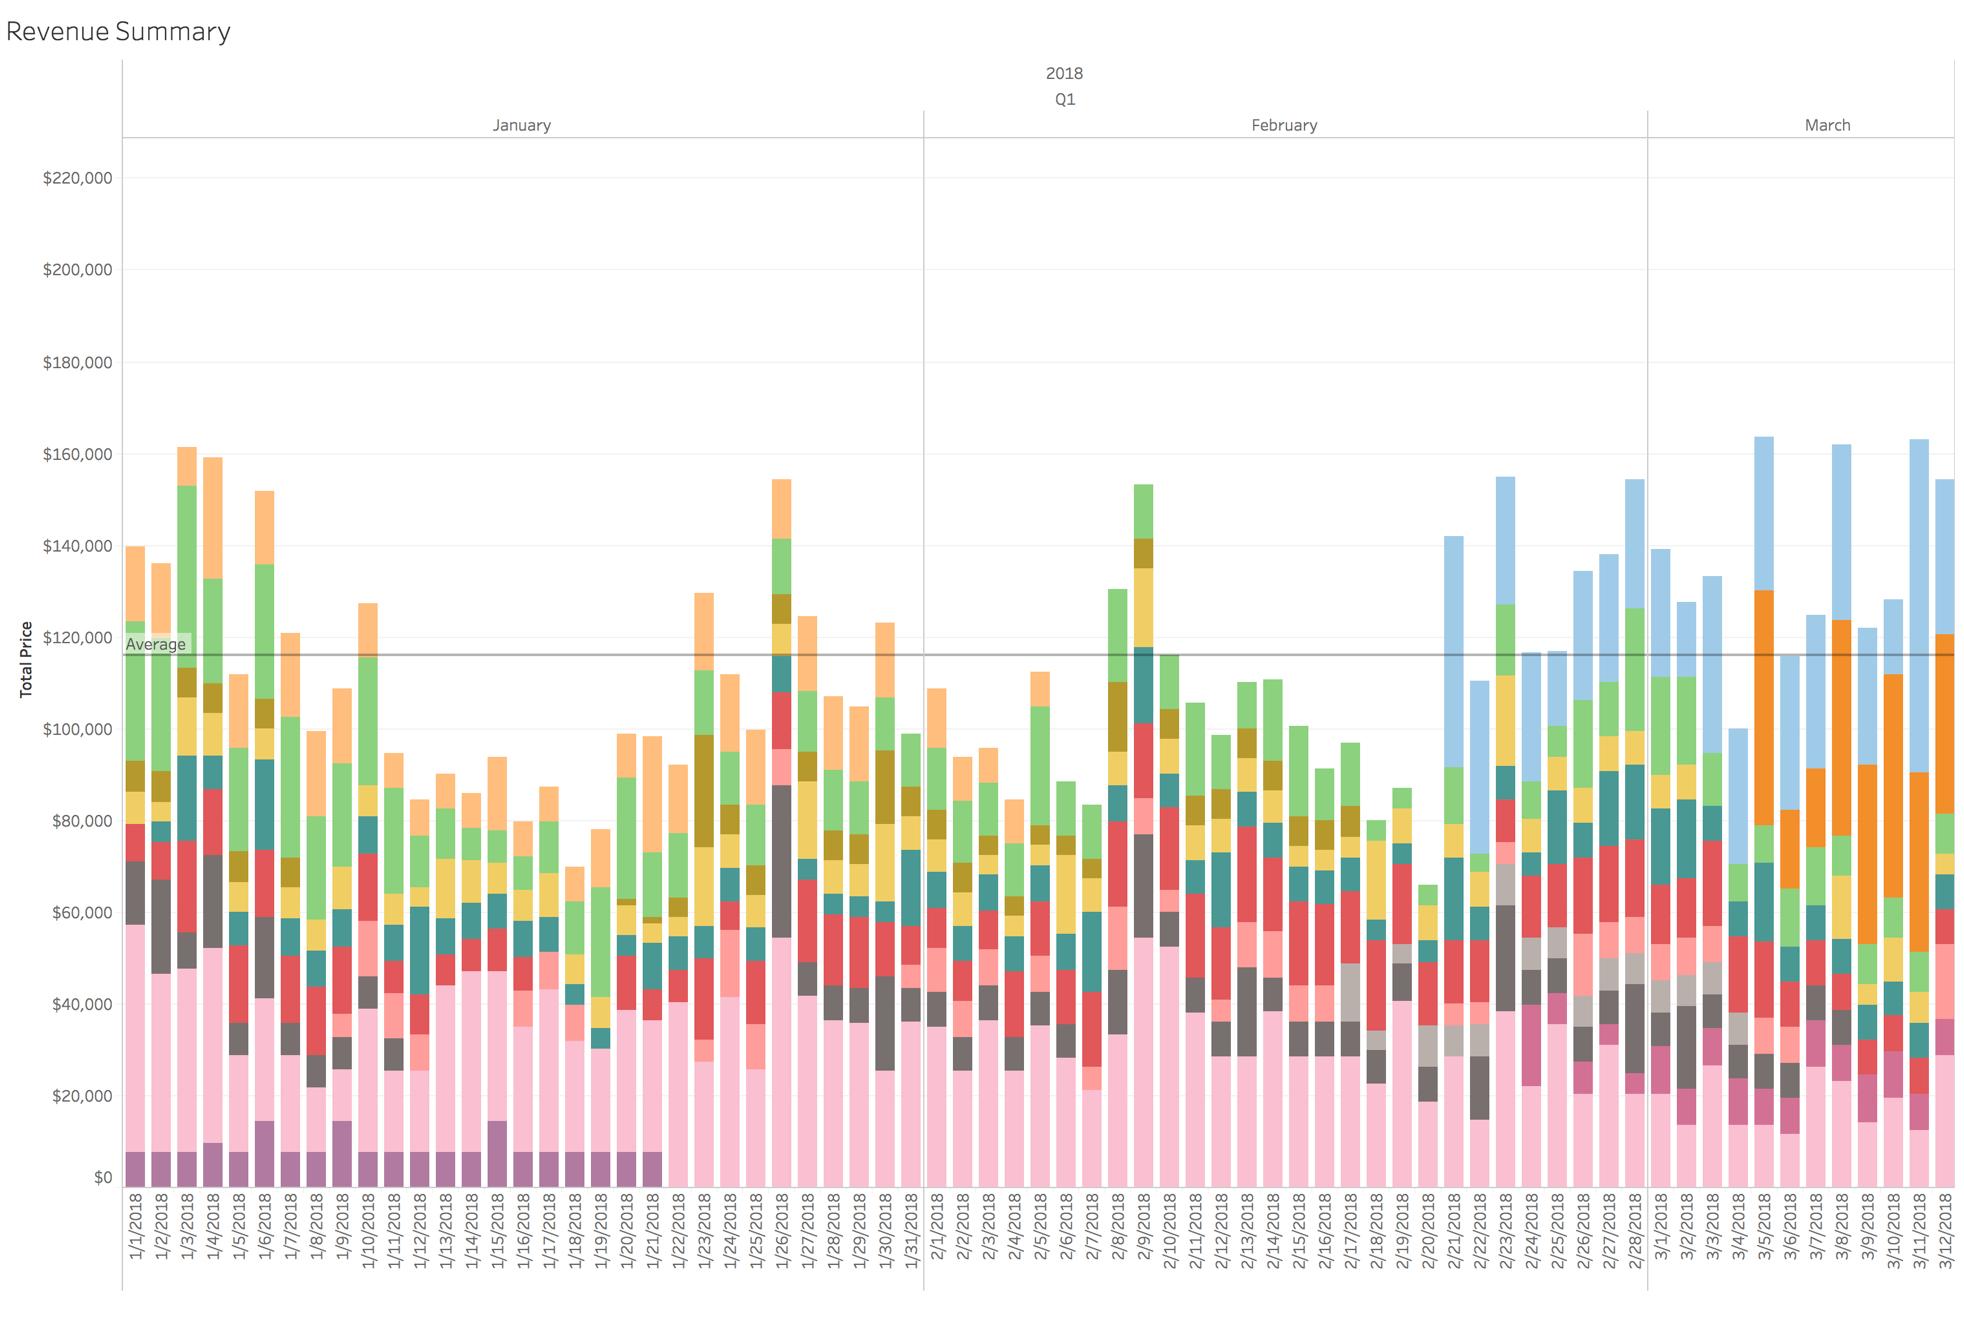 Drakewell revenue summary